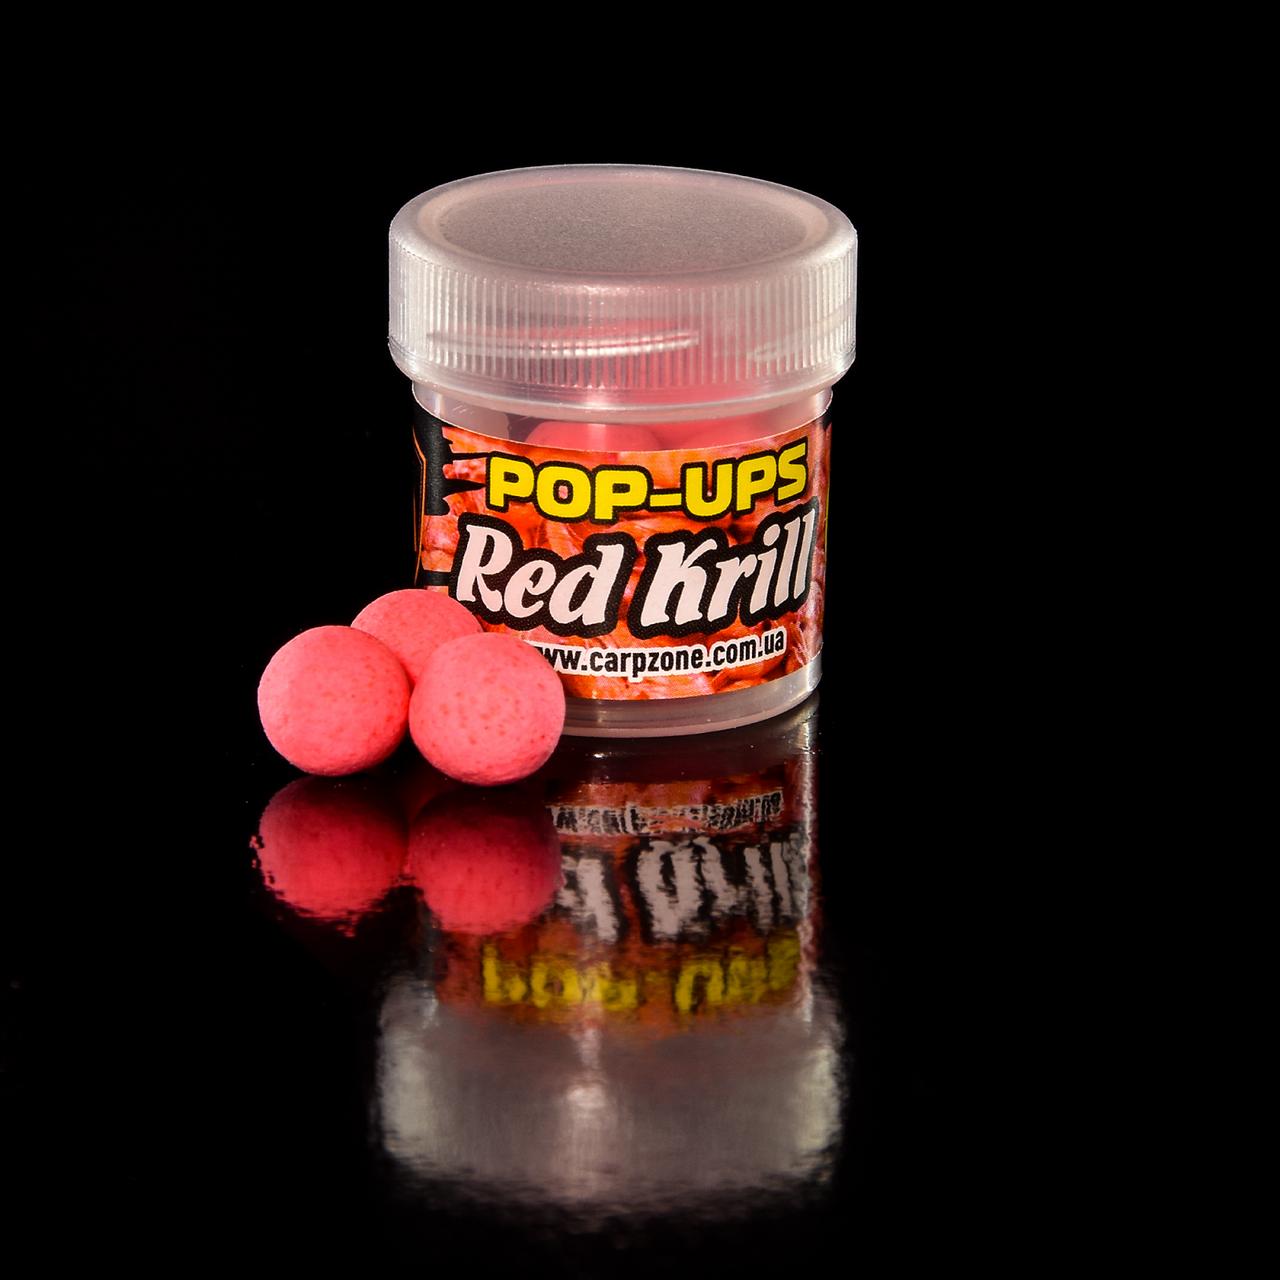 Поп Ап Pop-Ups Fluro Red Кrill (Червона Креветка) 12mm/10pc